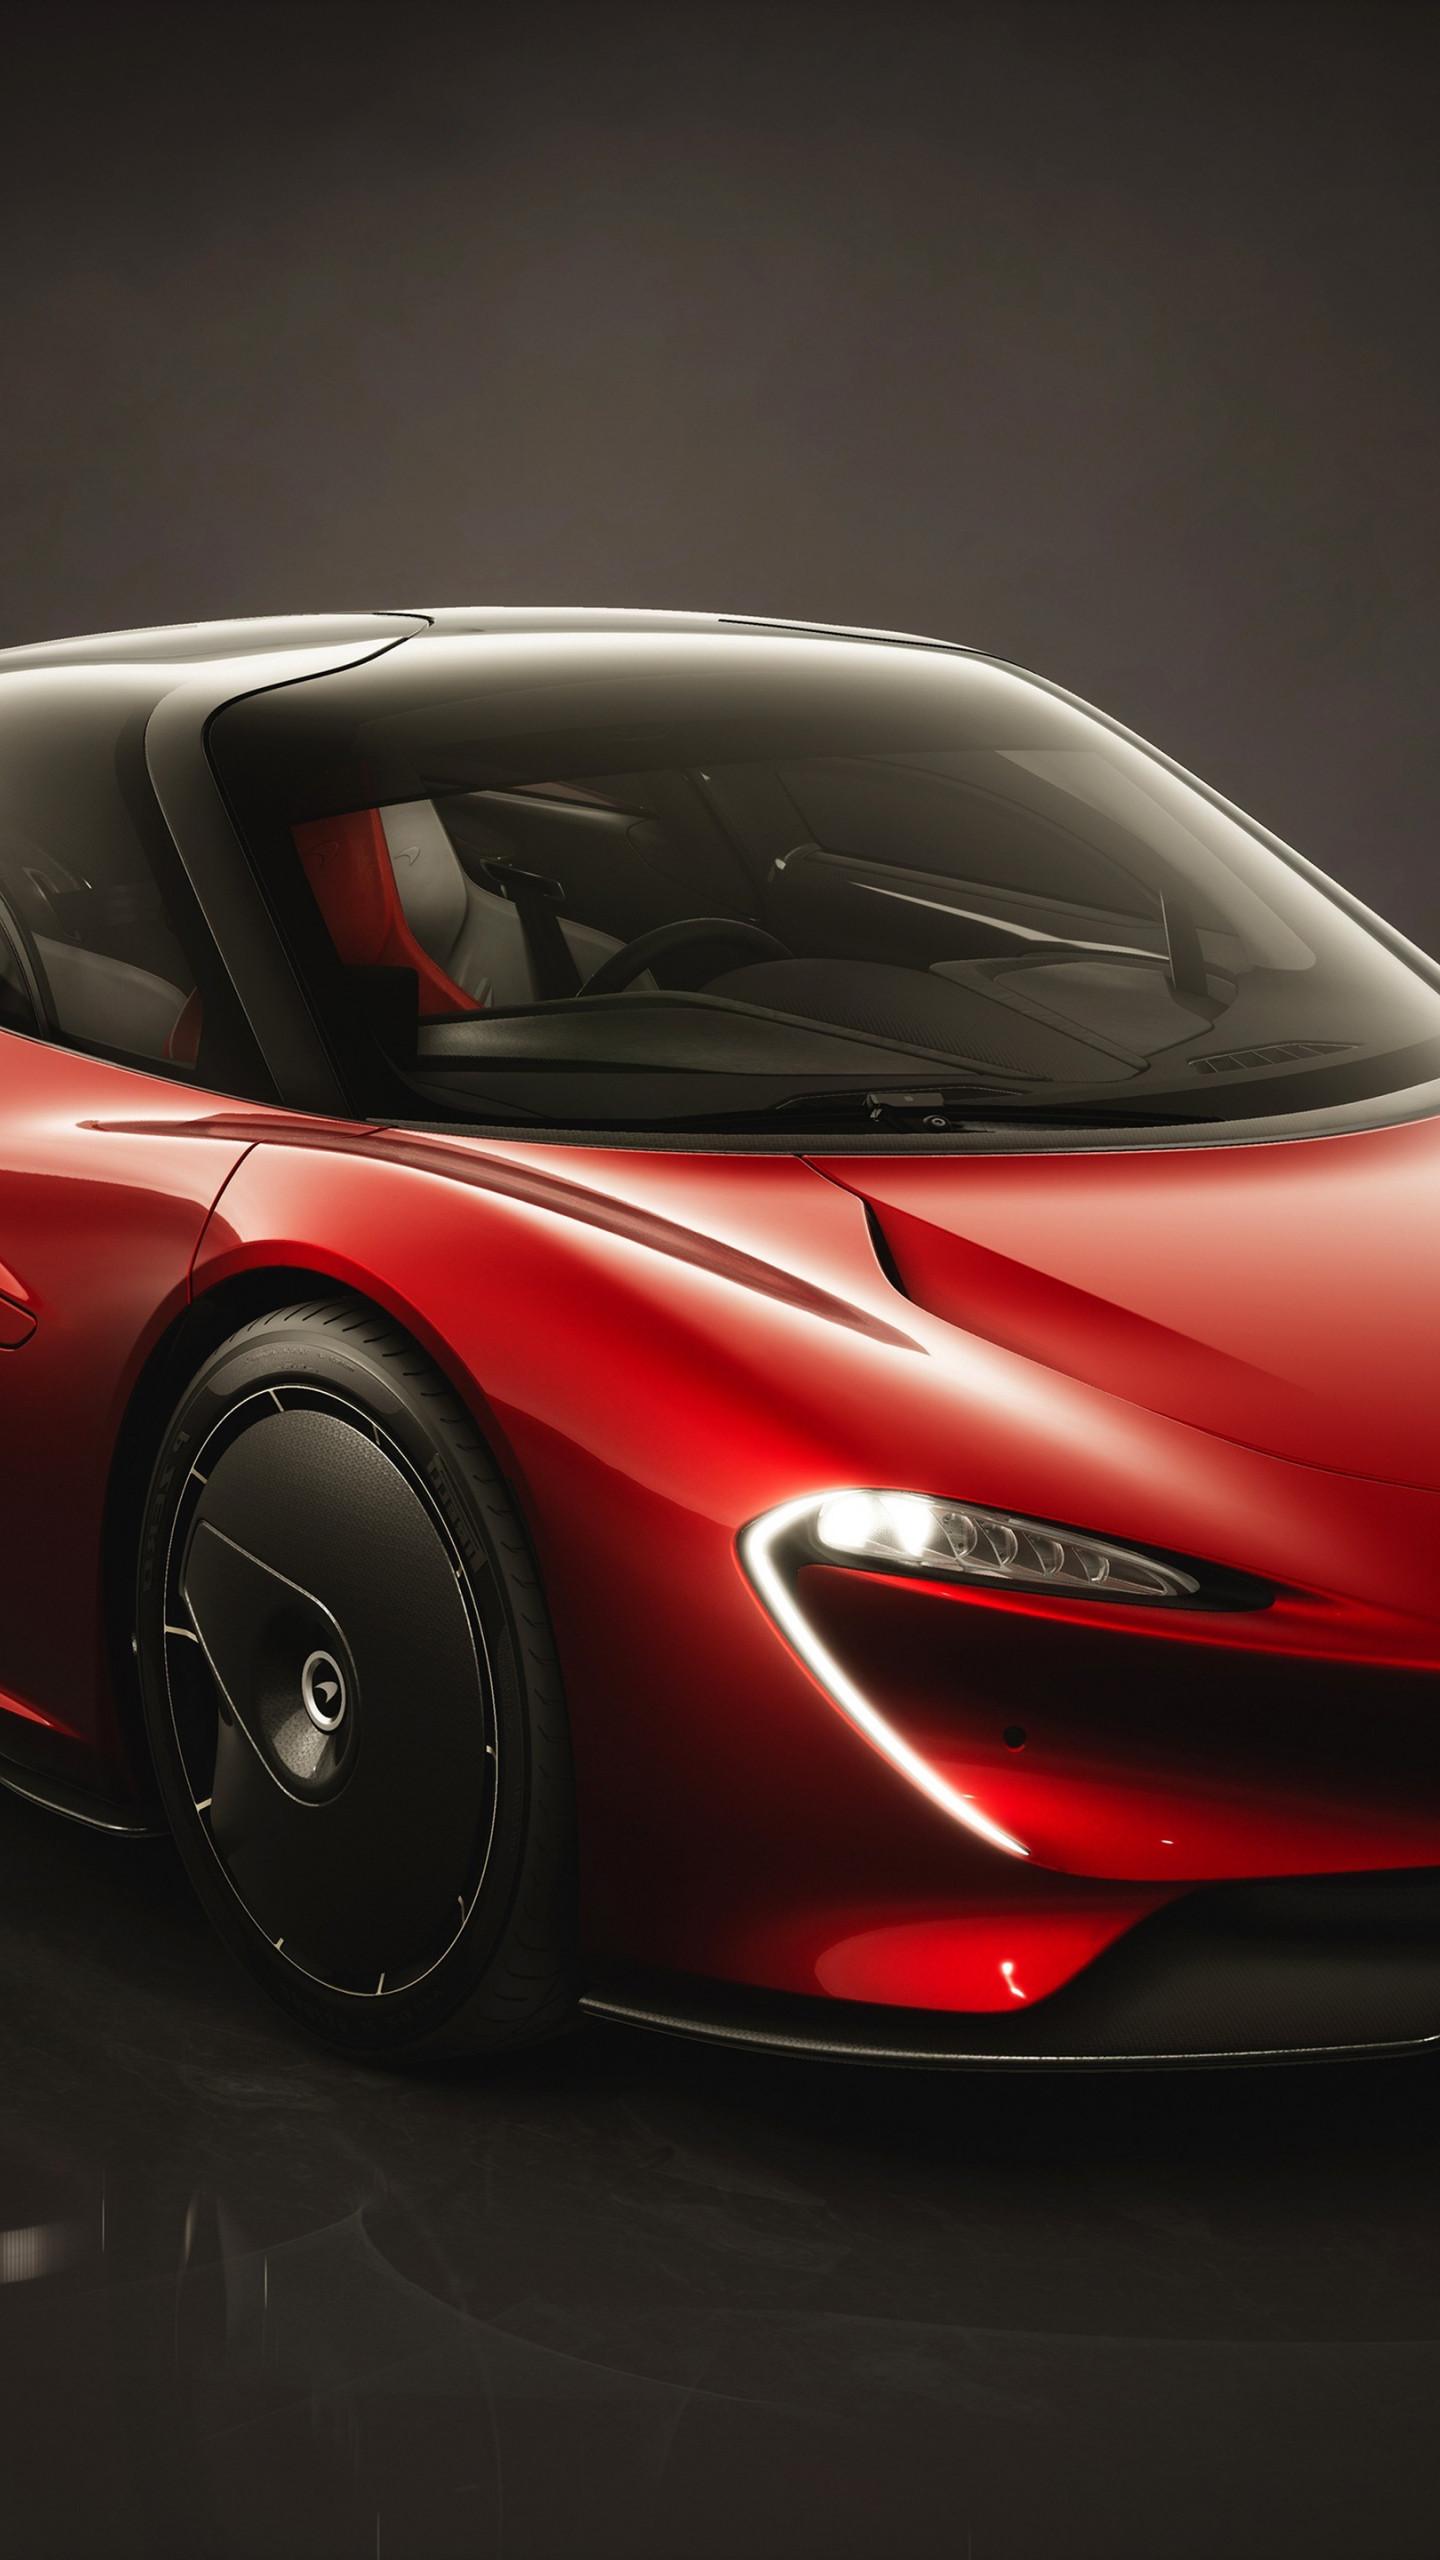 Download wallpaper McLaren Speedtail Bloodline 1440x2560 1440x2560